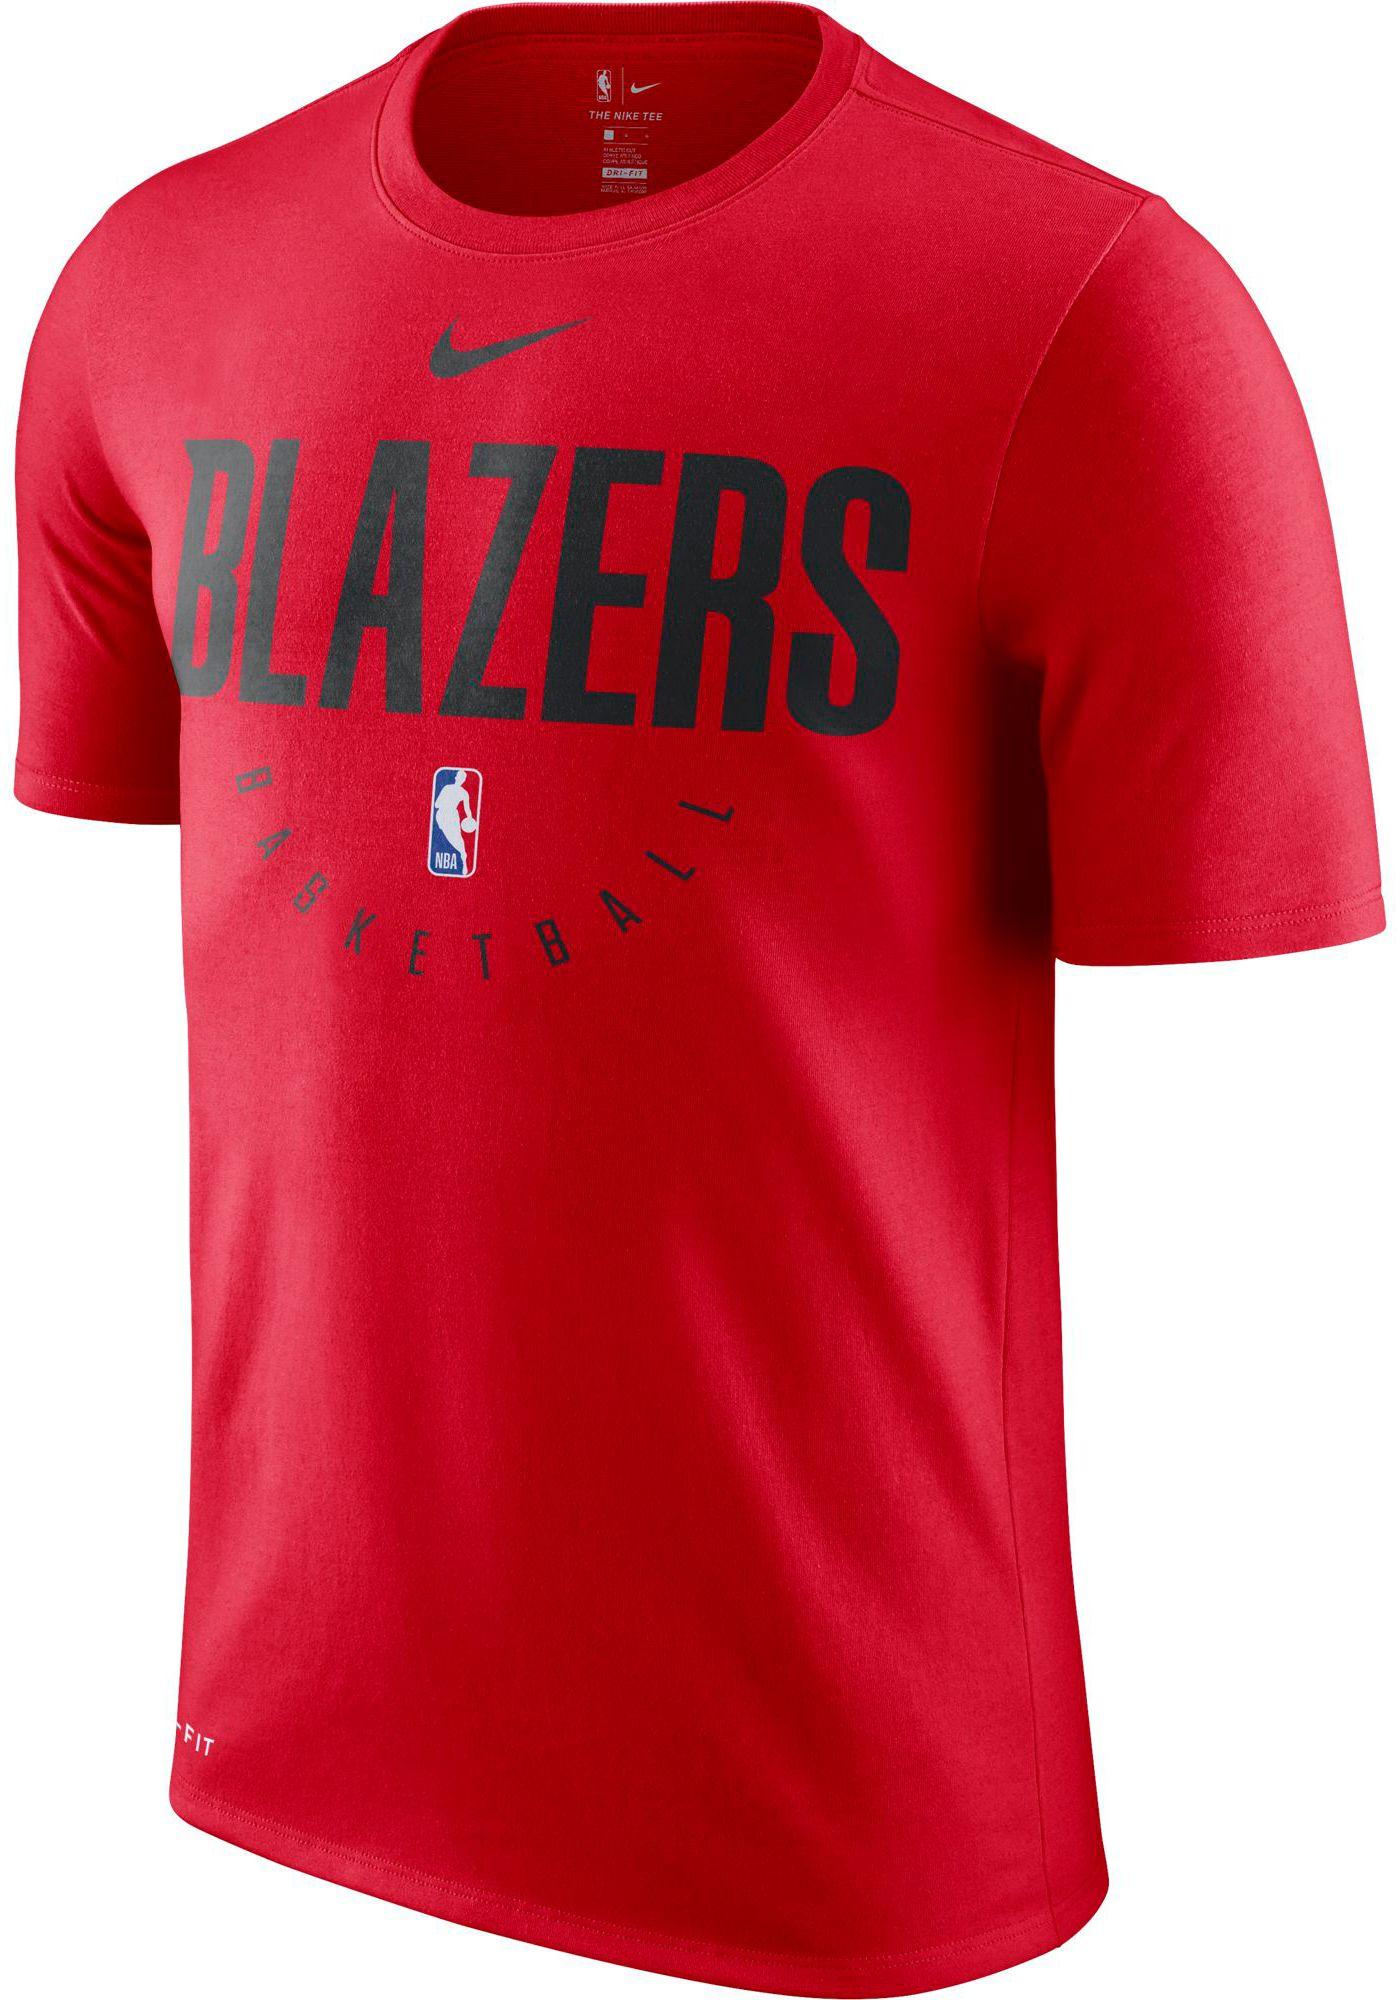 Nike Men's Portland Trail Blazers Dri-FIT Practice T-Shirt